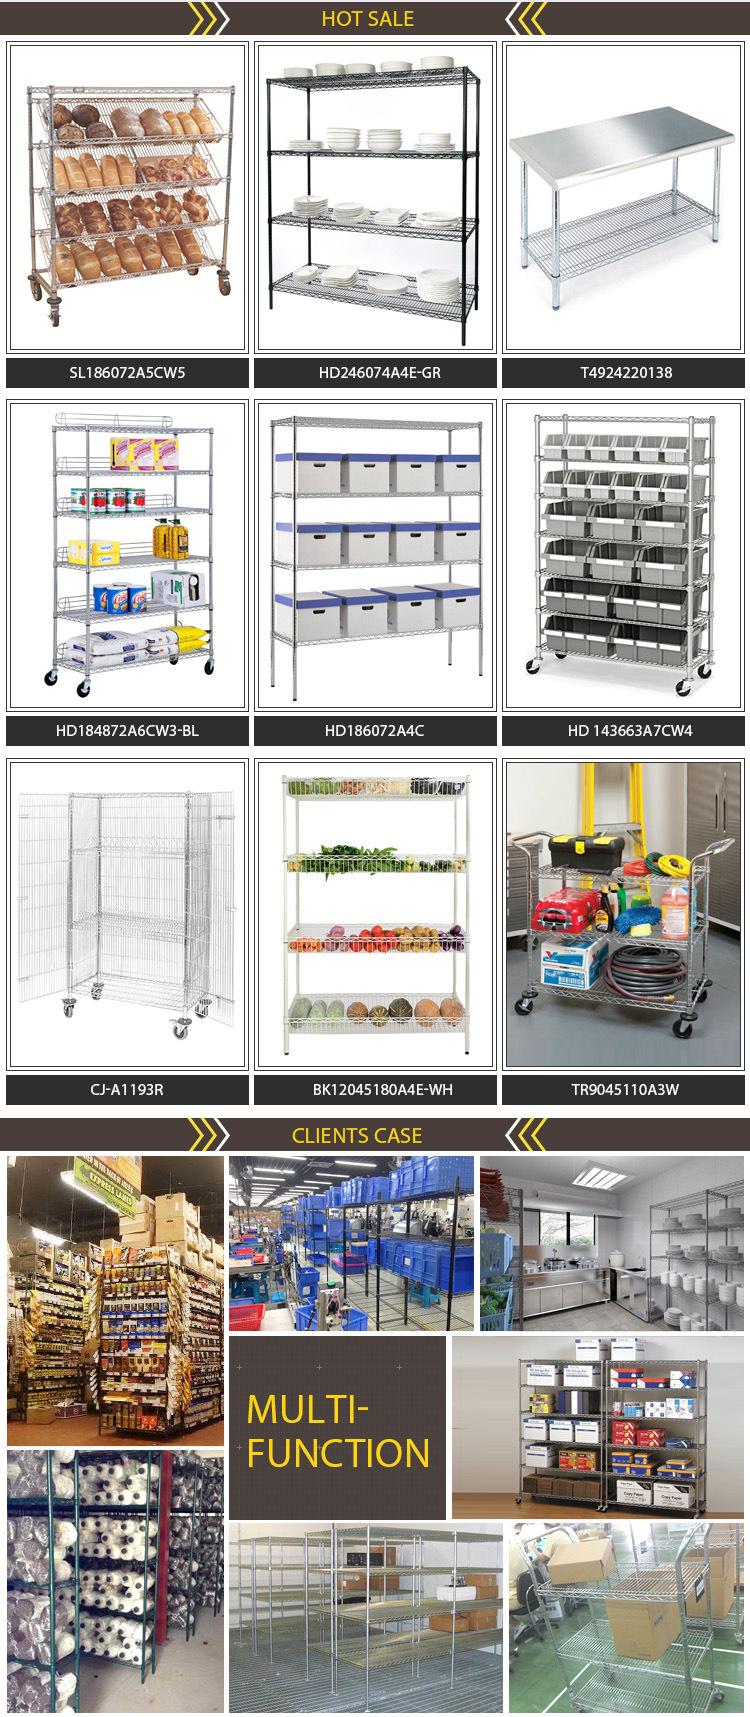 New Design Heavy Duty 150kg Adjustable 4 Shelves Commercial Equipment Kitchen Storage Rack